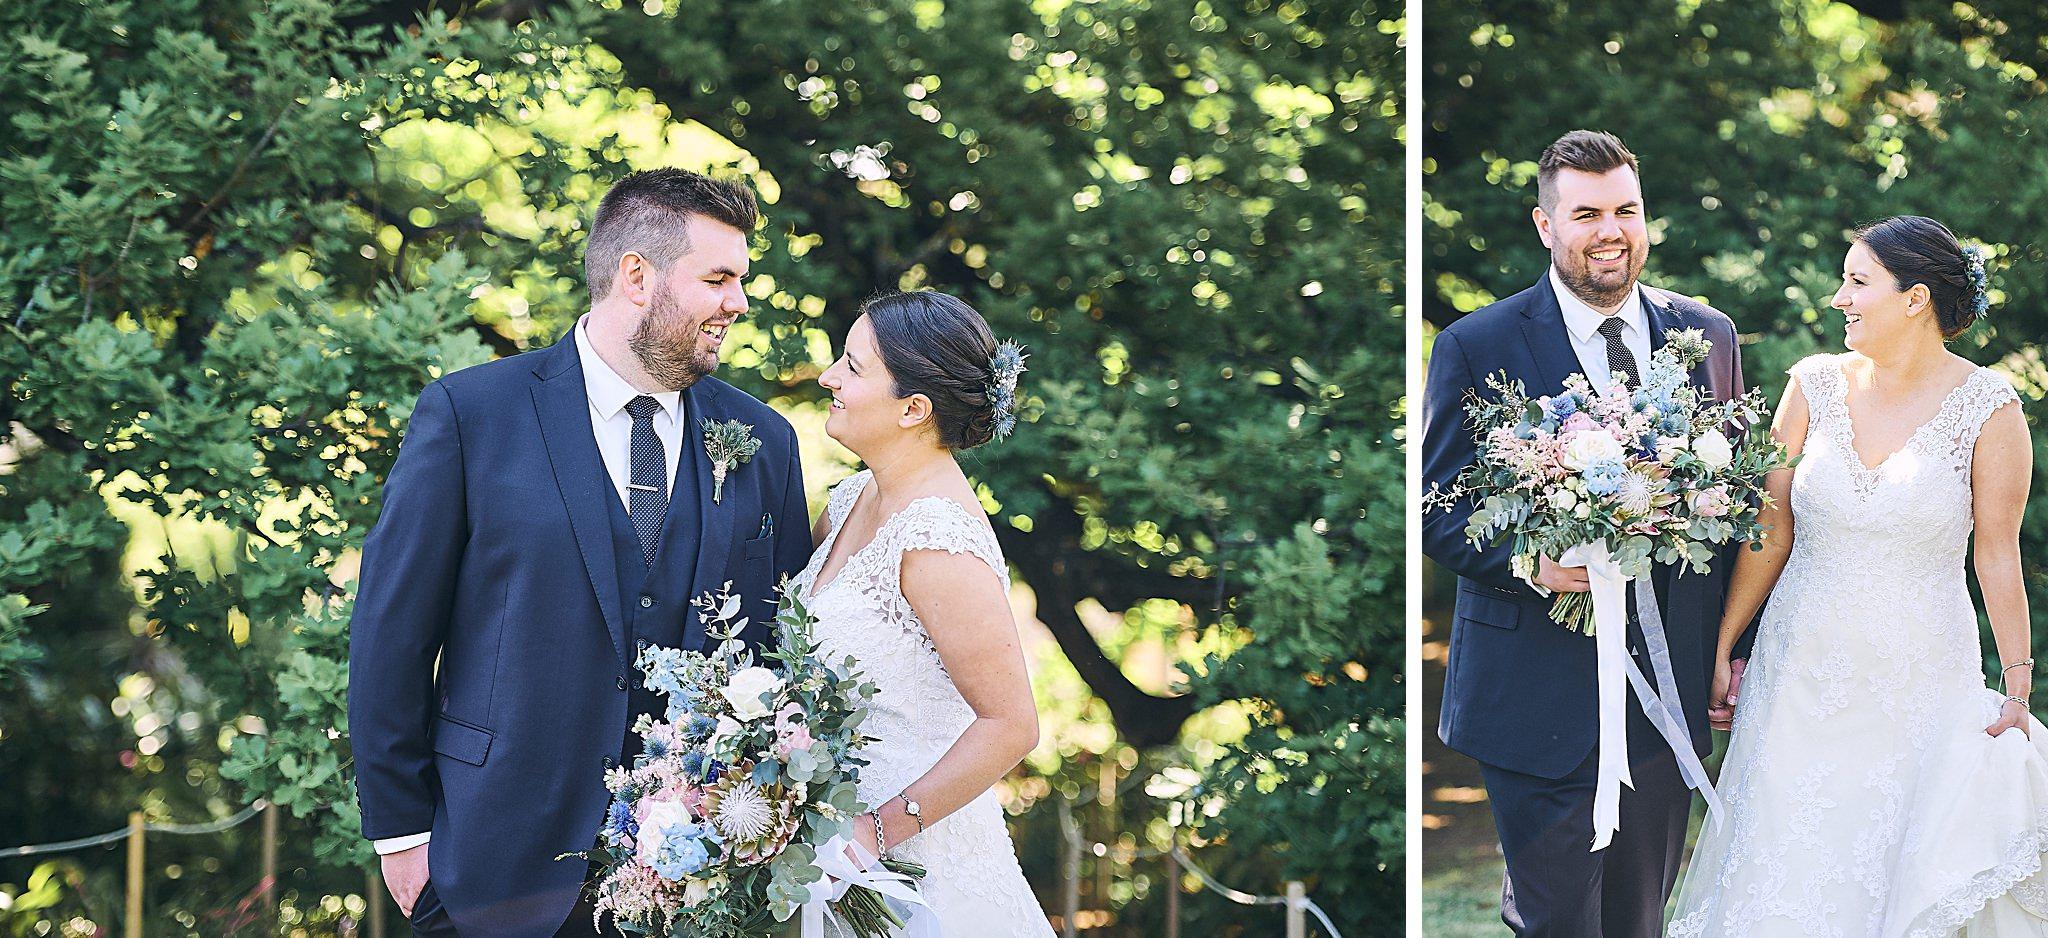 wedding_photographer_adelaide_0002.jpg